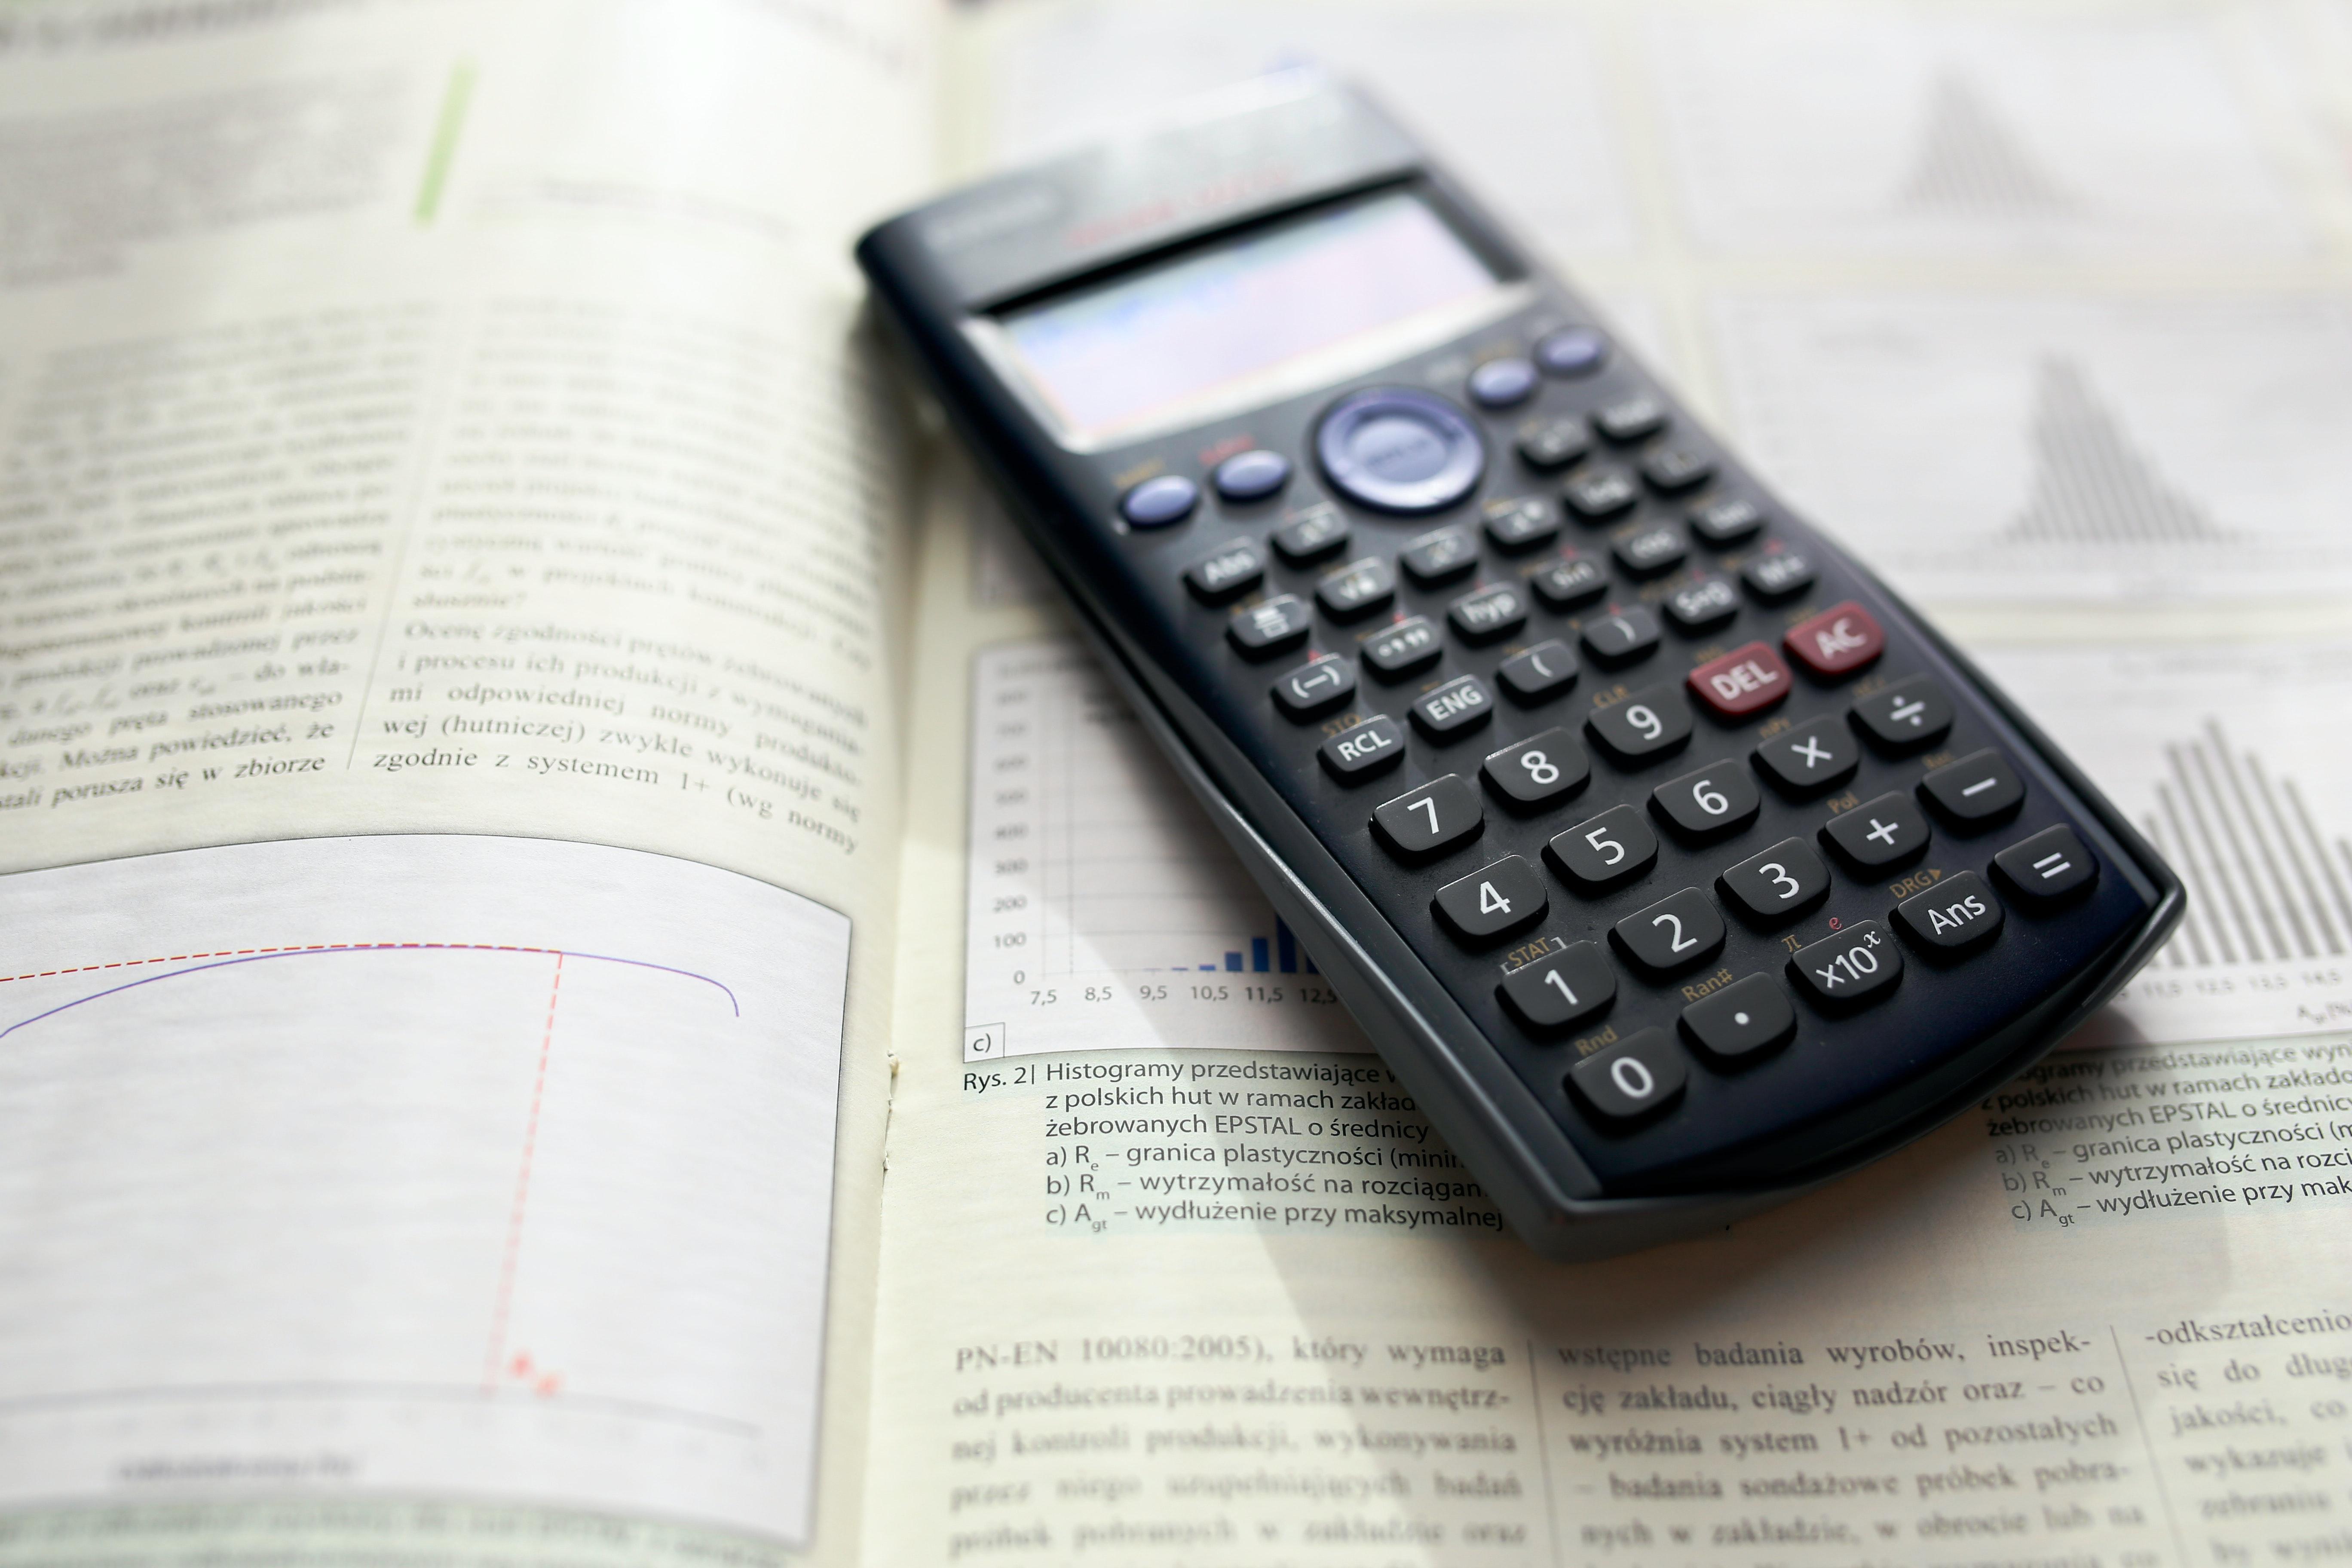 Engineering Review 1: Mathematics